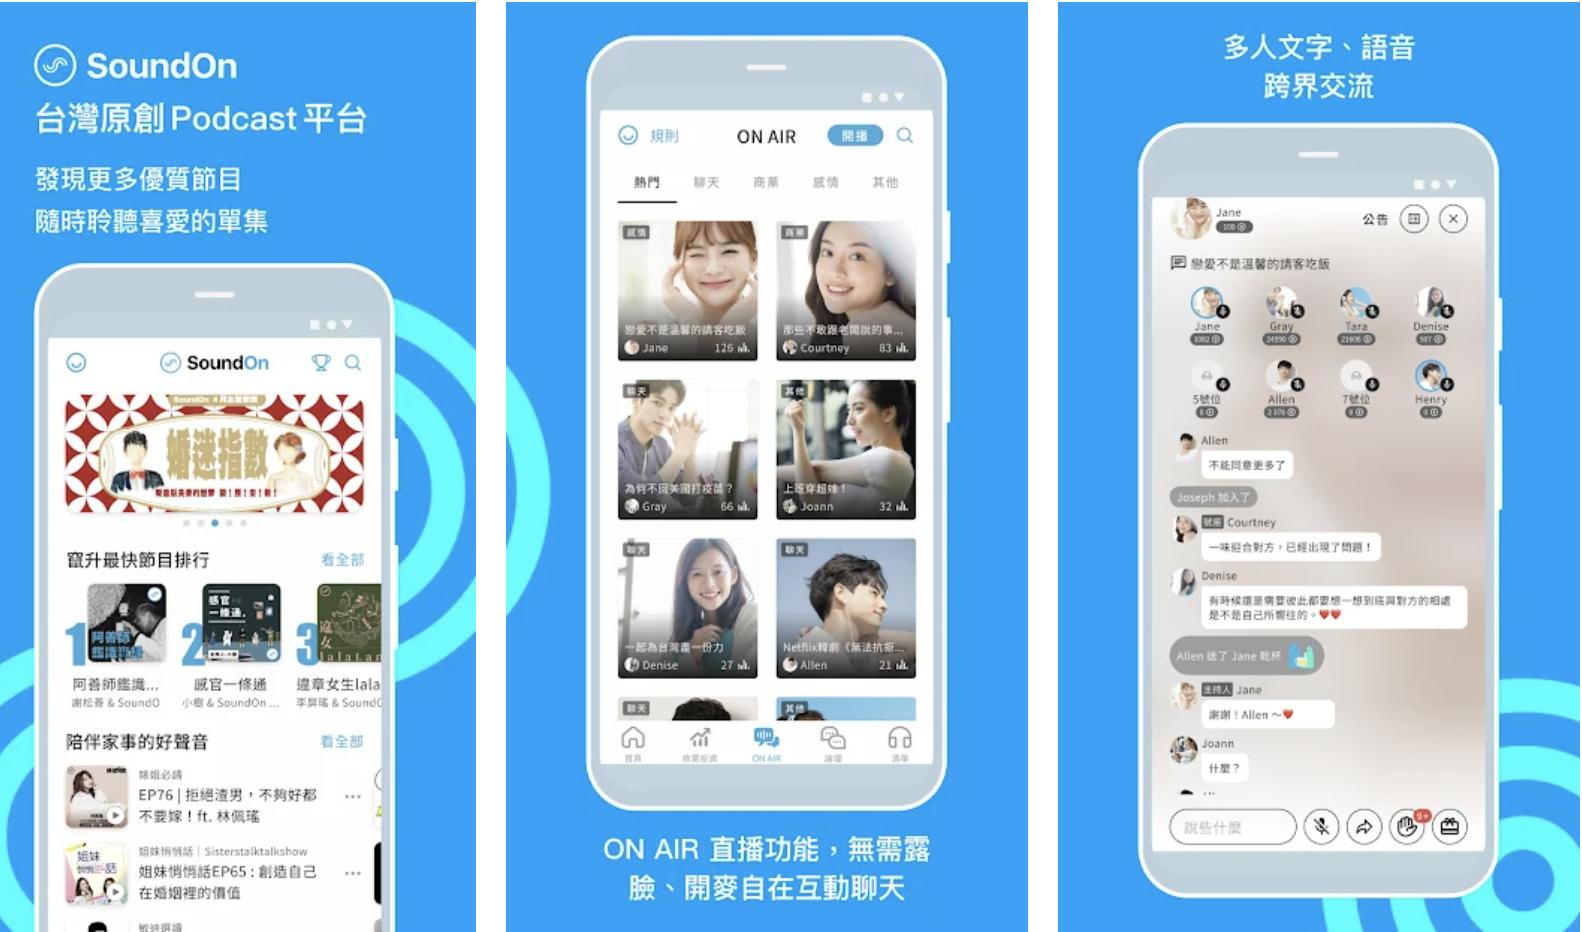 SoundOn推出新服務ON AIR 語音聊天社群首創「送禮機制」助攻聲音創作者